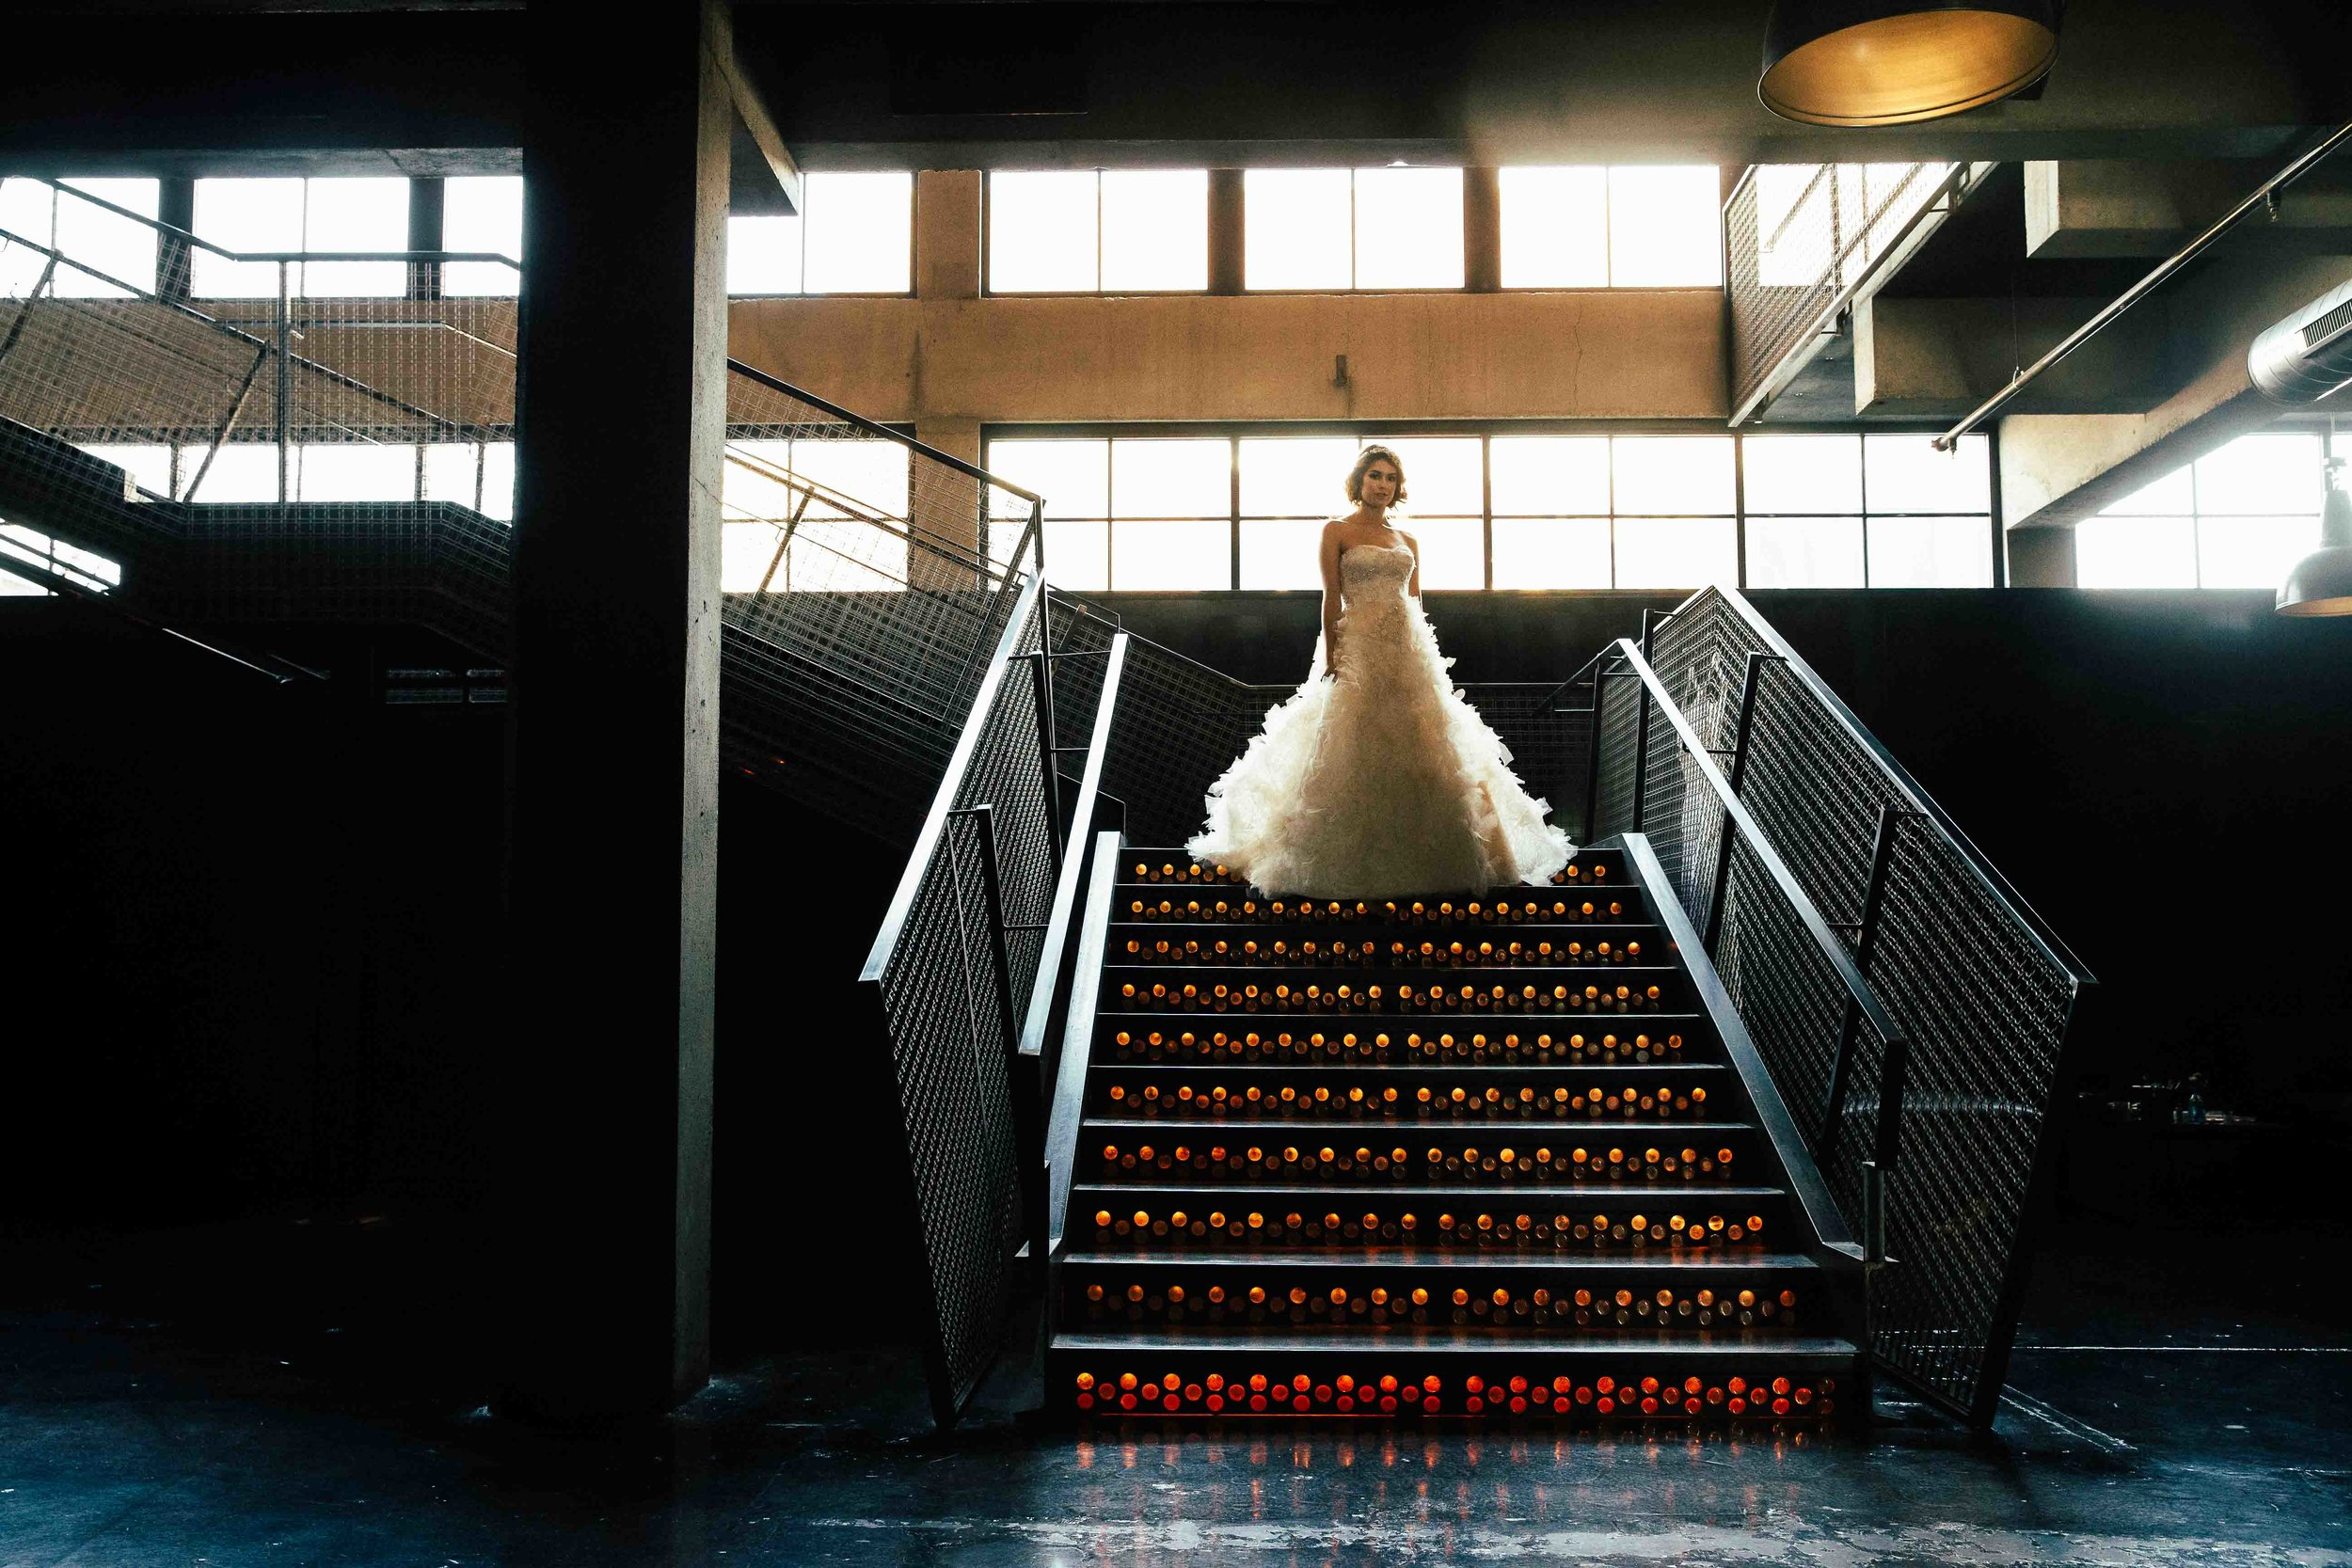 rose-photographics-bride-portrait.jpg